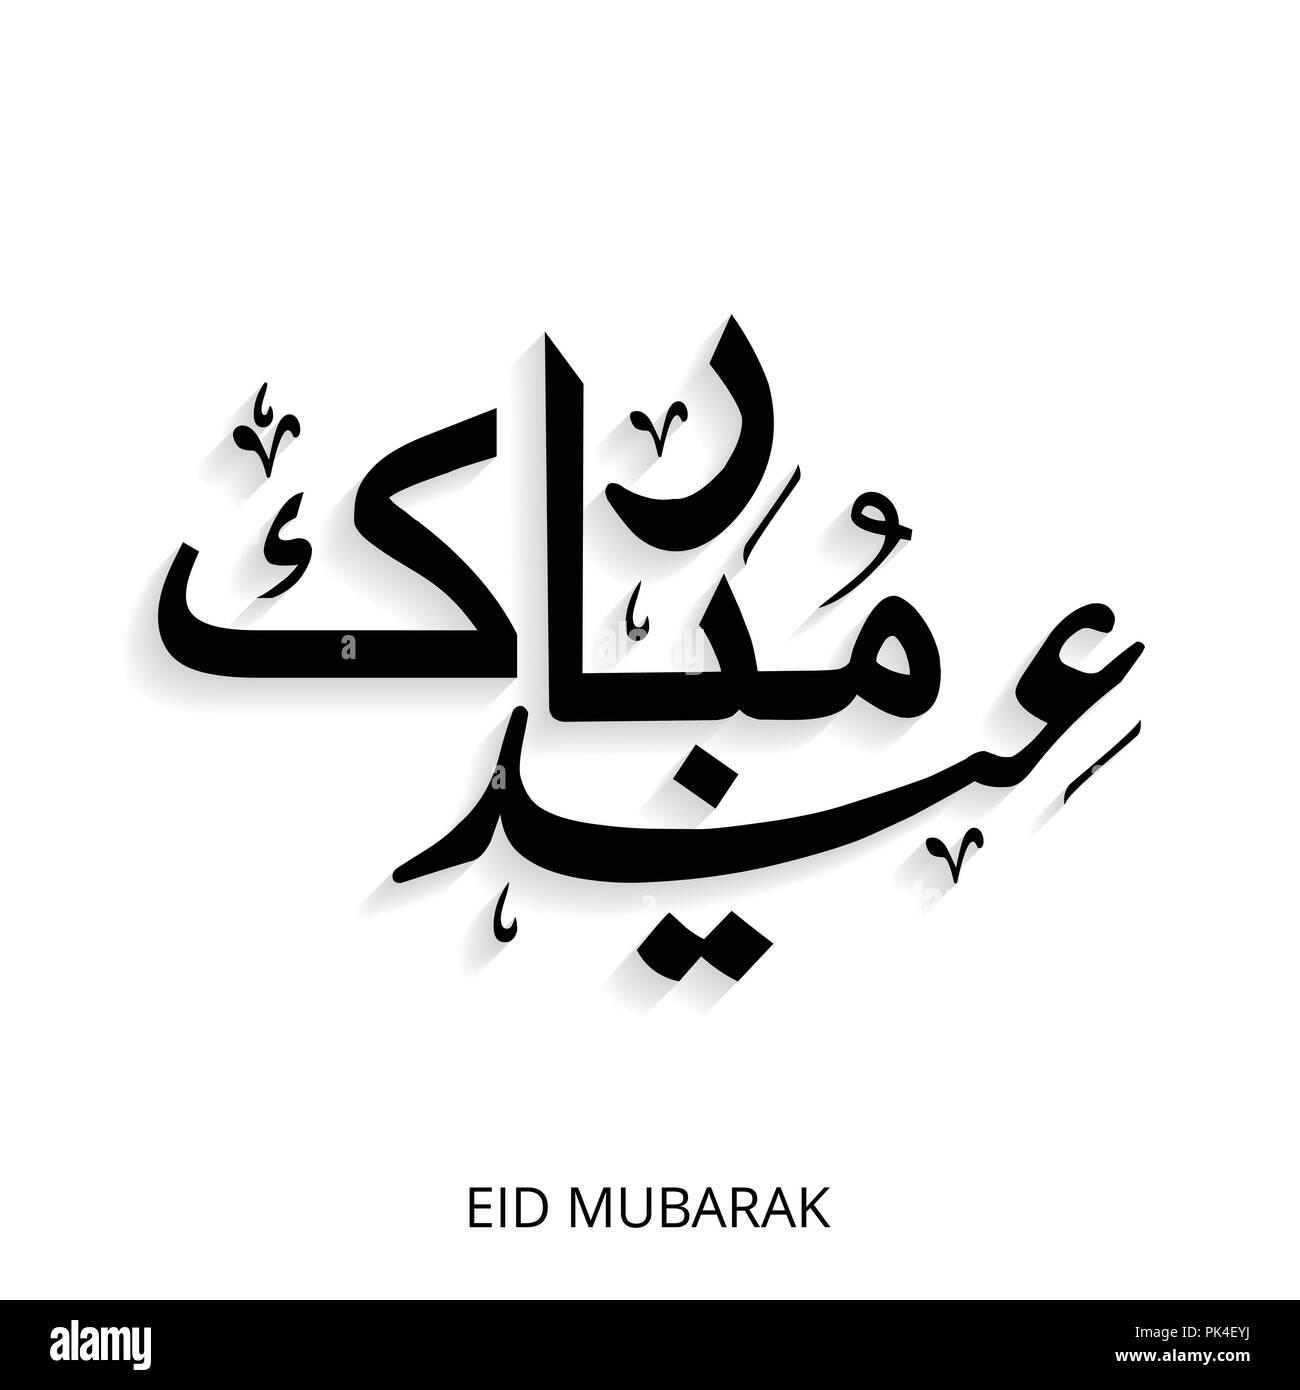 Eid Mubarak Deisgn With Typography And Creative Deisgn Vector Stock Vector Image Art Alamy